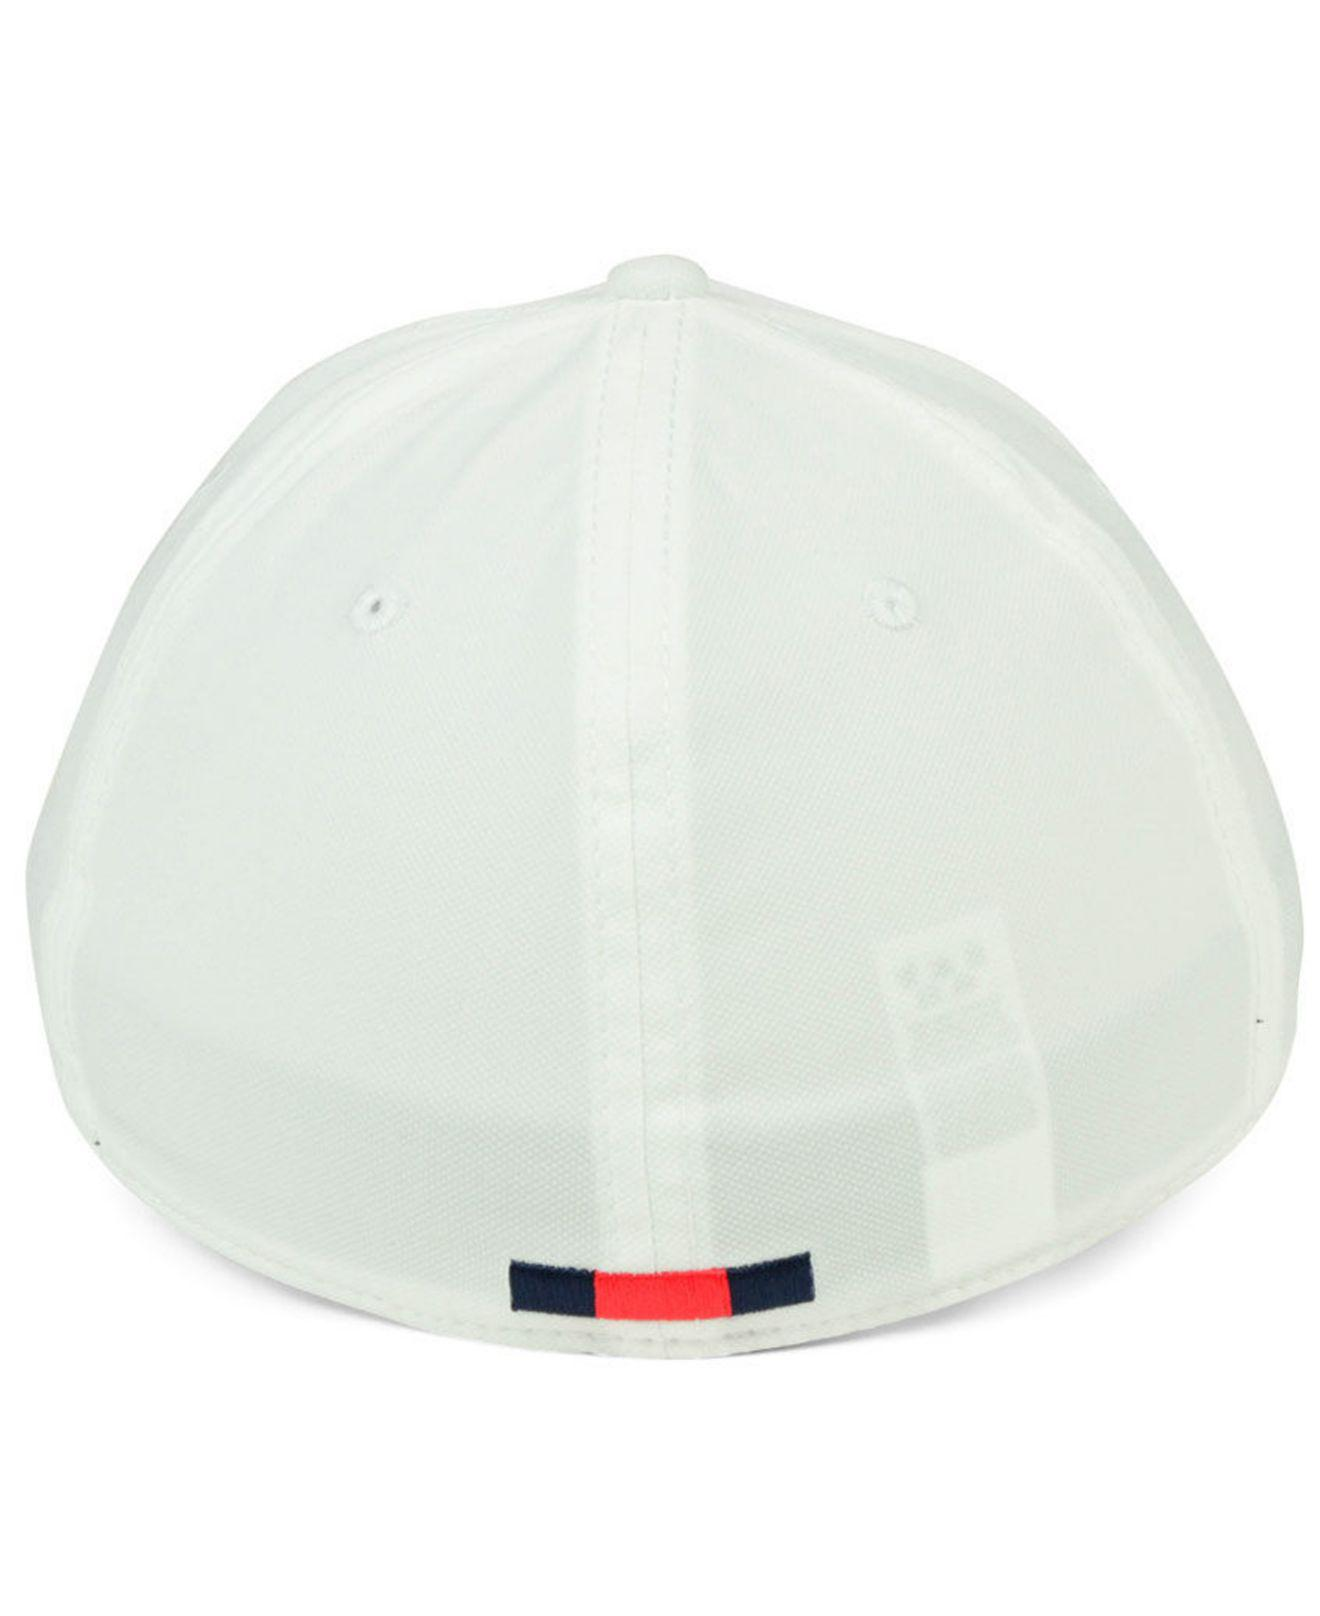 online retailer 9f33b c076c ... true vapor performance fitted hat d806c f381a  greece nike white ole  miss rebels col cap for men lyst. view fullscreen e4e8c 88de7